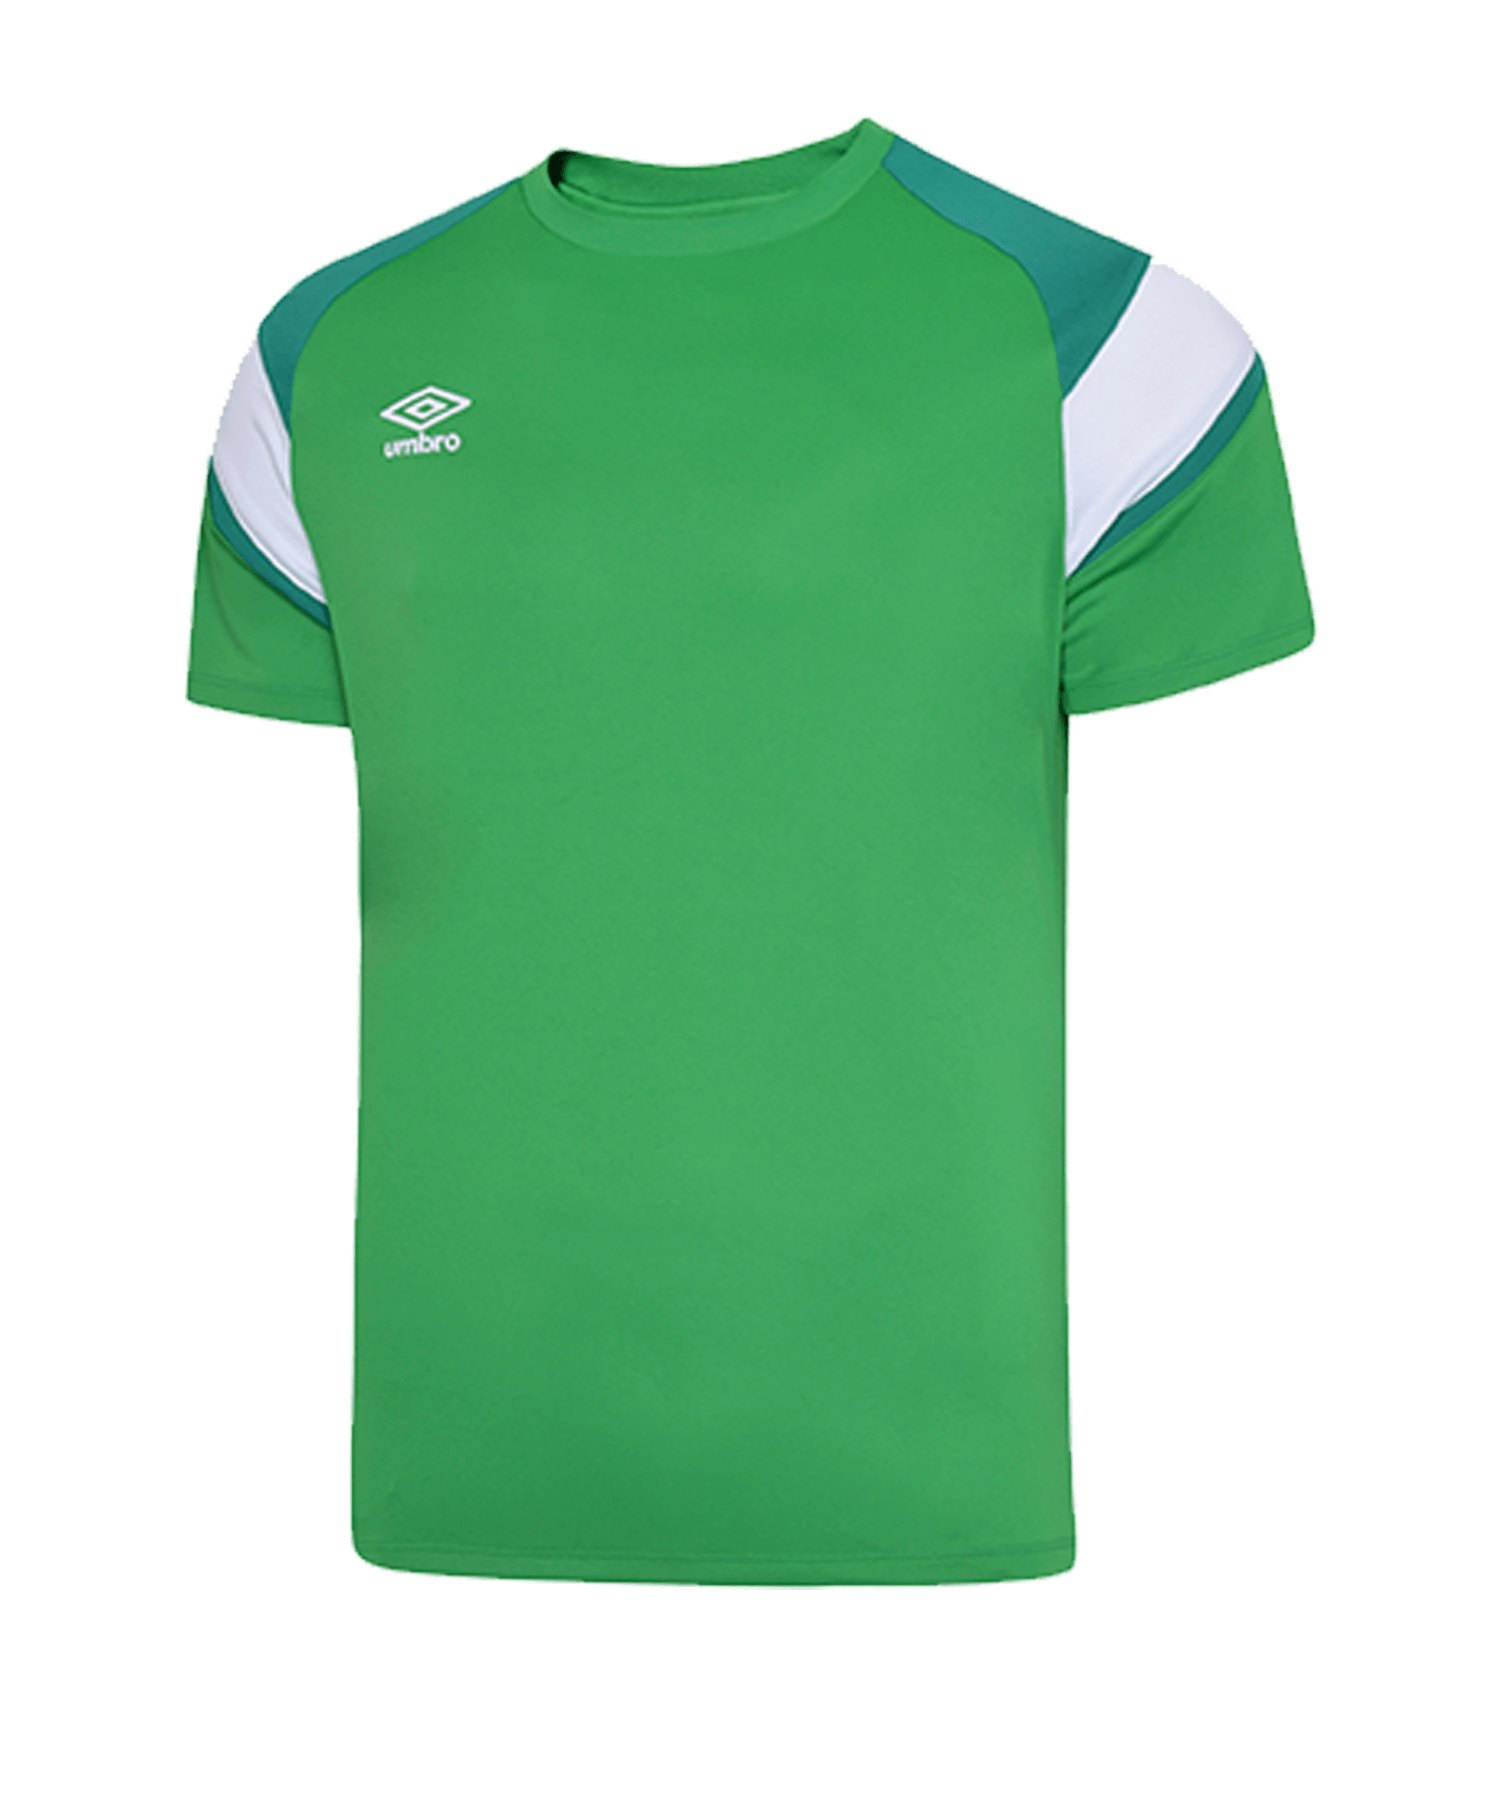 Umbro Training Jersey Trikot Grün FGRE - gruen